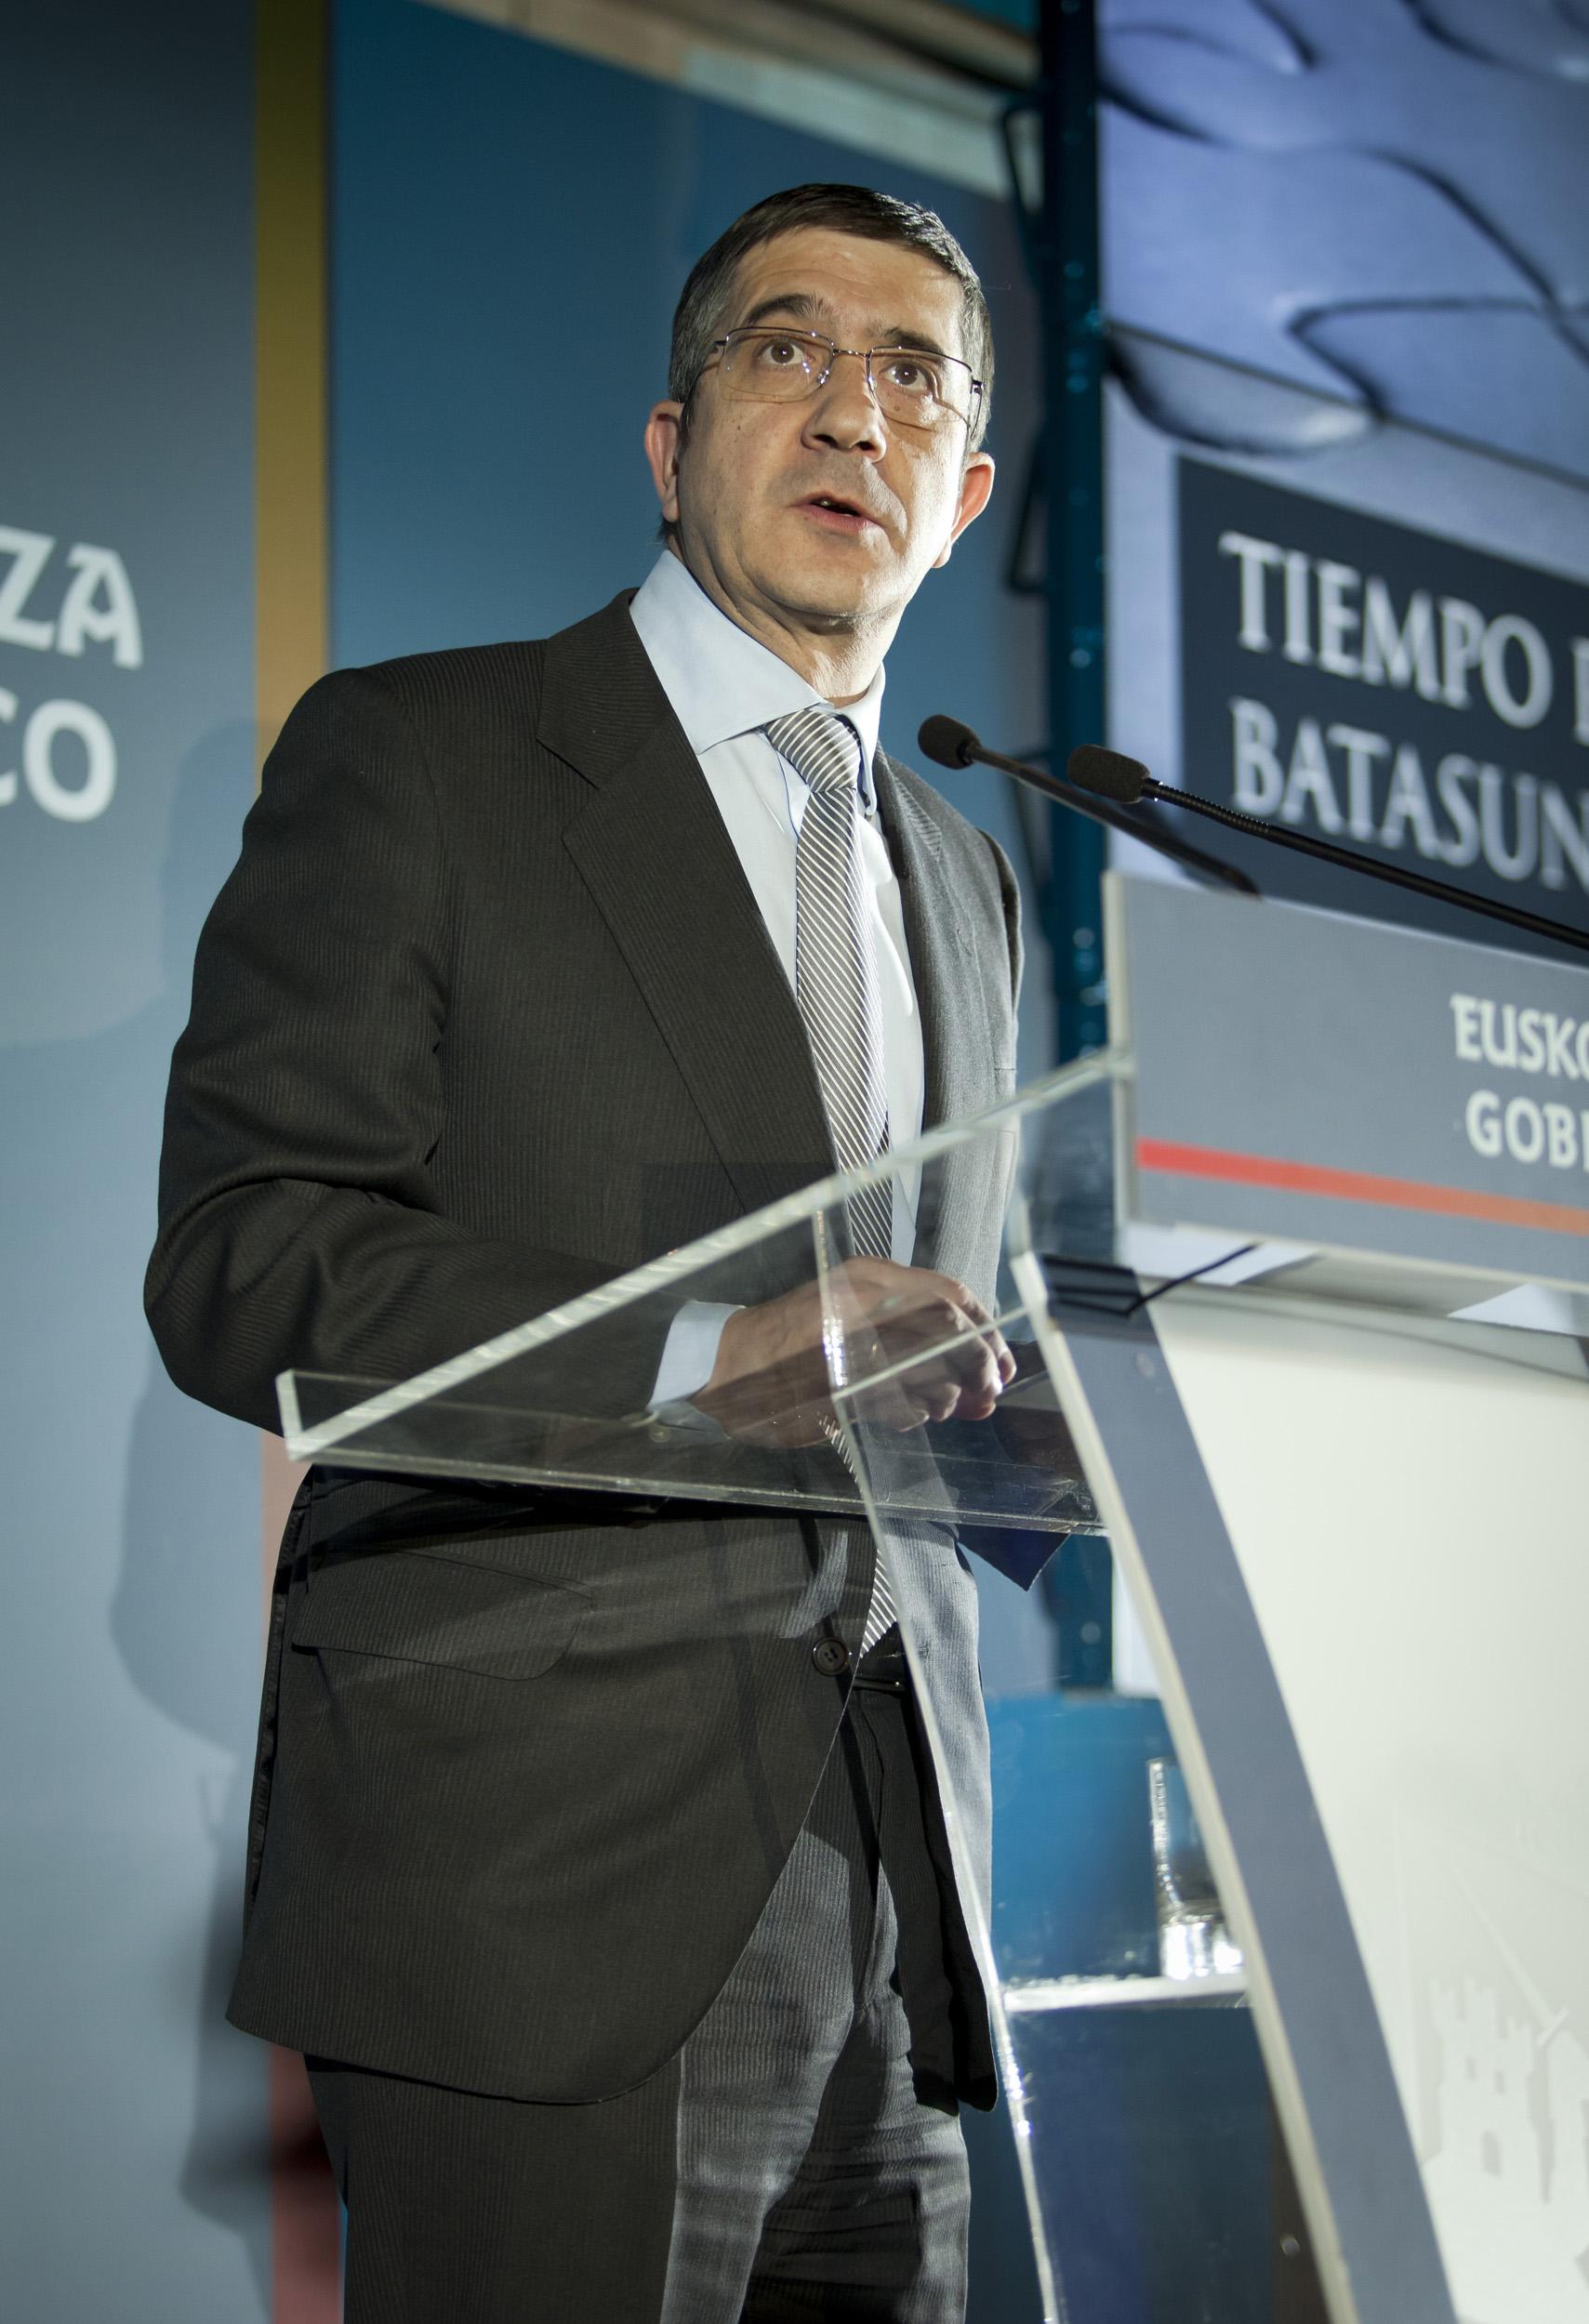 sociedad_vasca16.jpg